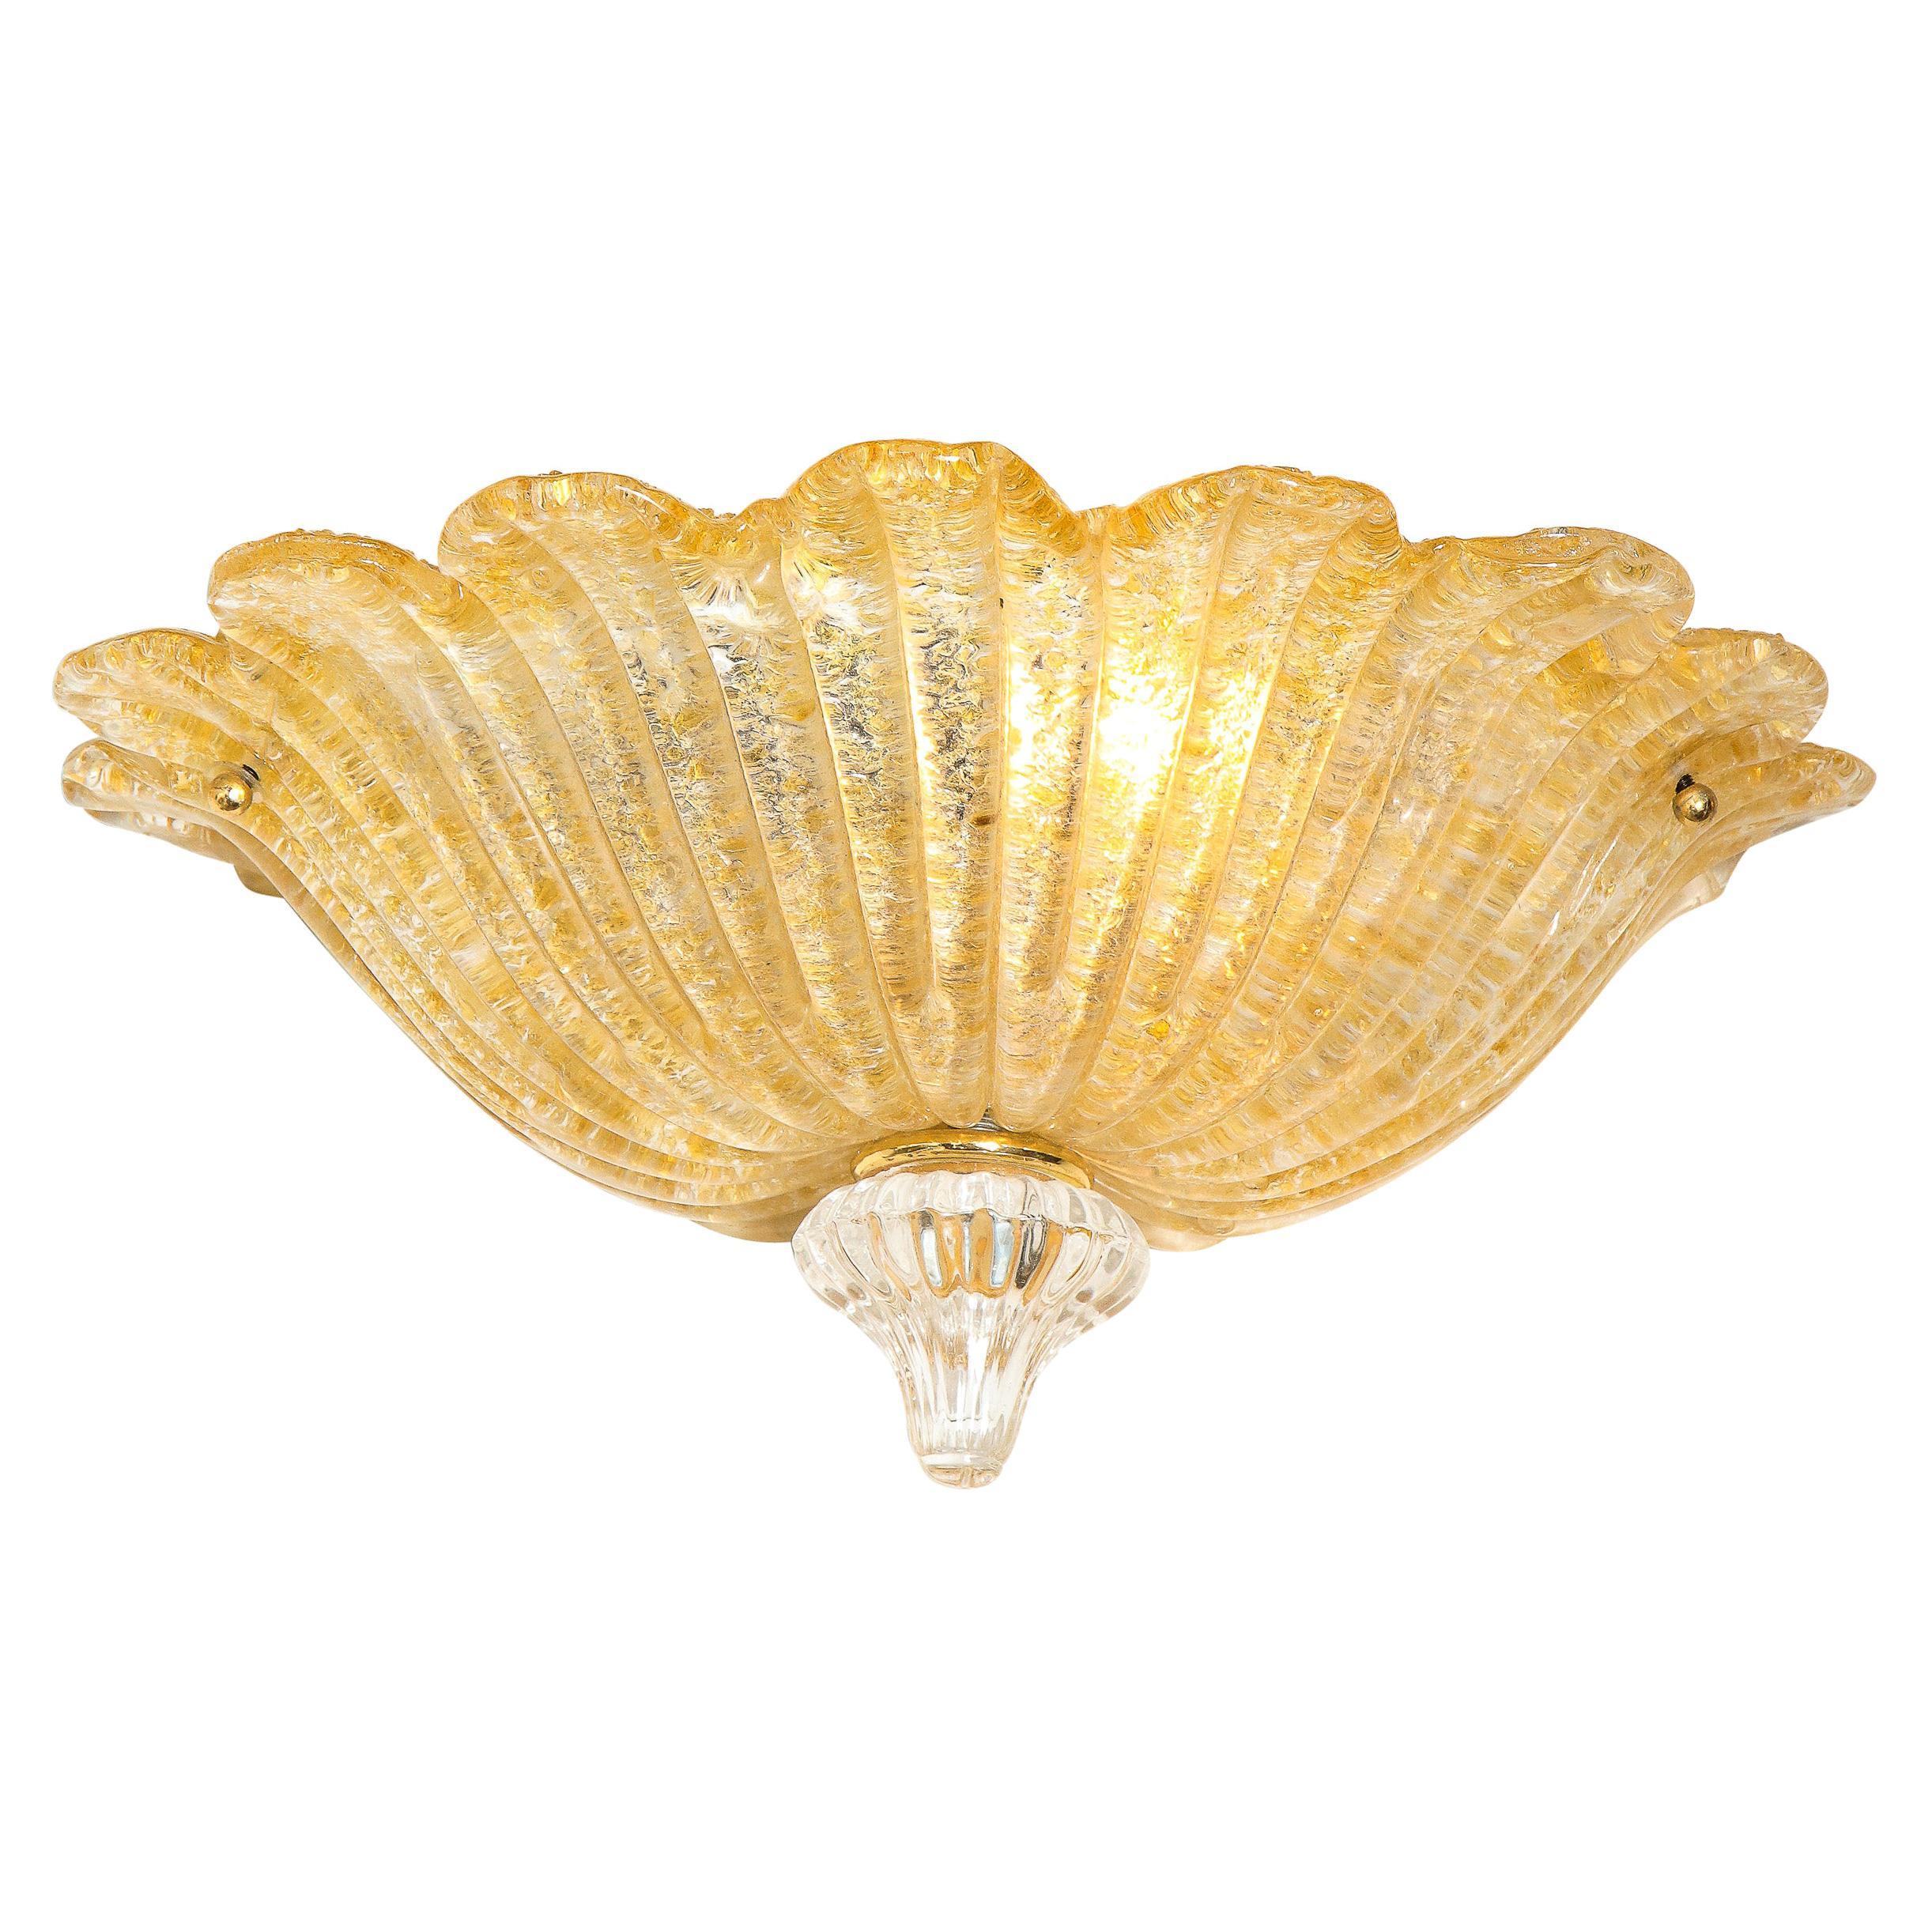 Modernist Handblown Murano Glass Sconce with 24kt Gold Flecks & Brass Fittings